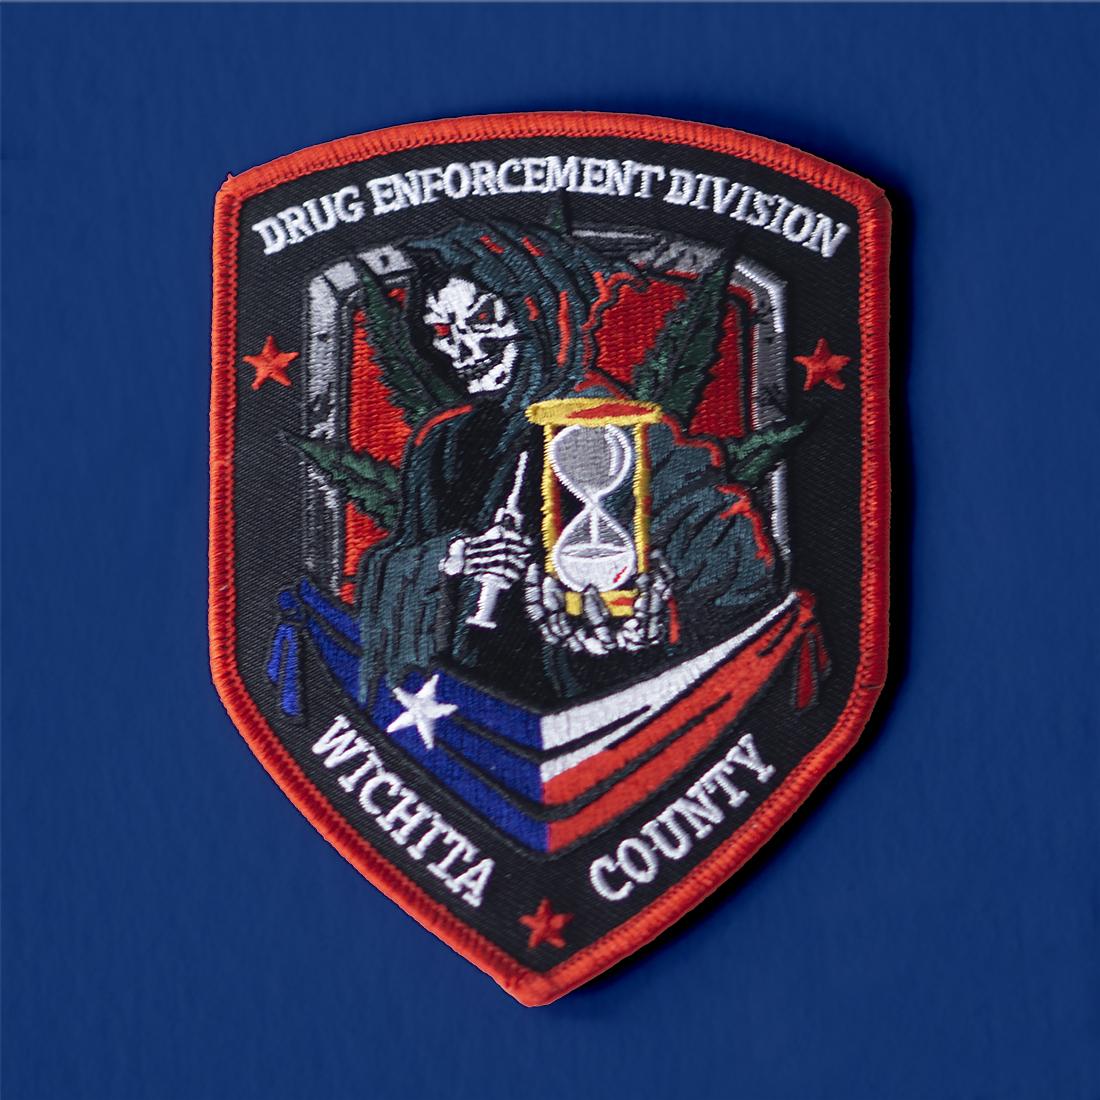 Wichita Falls Drug Enforcement Division patch design